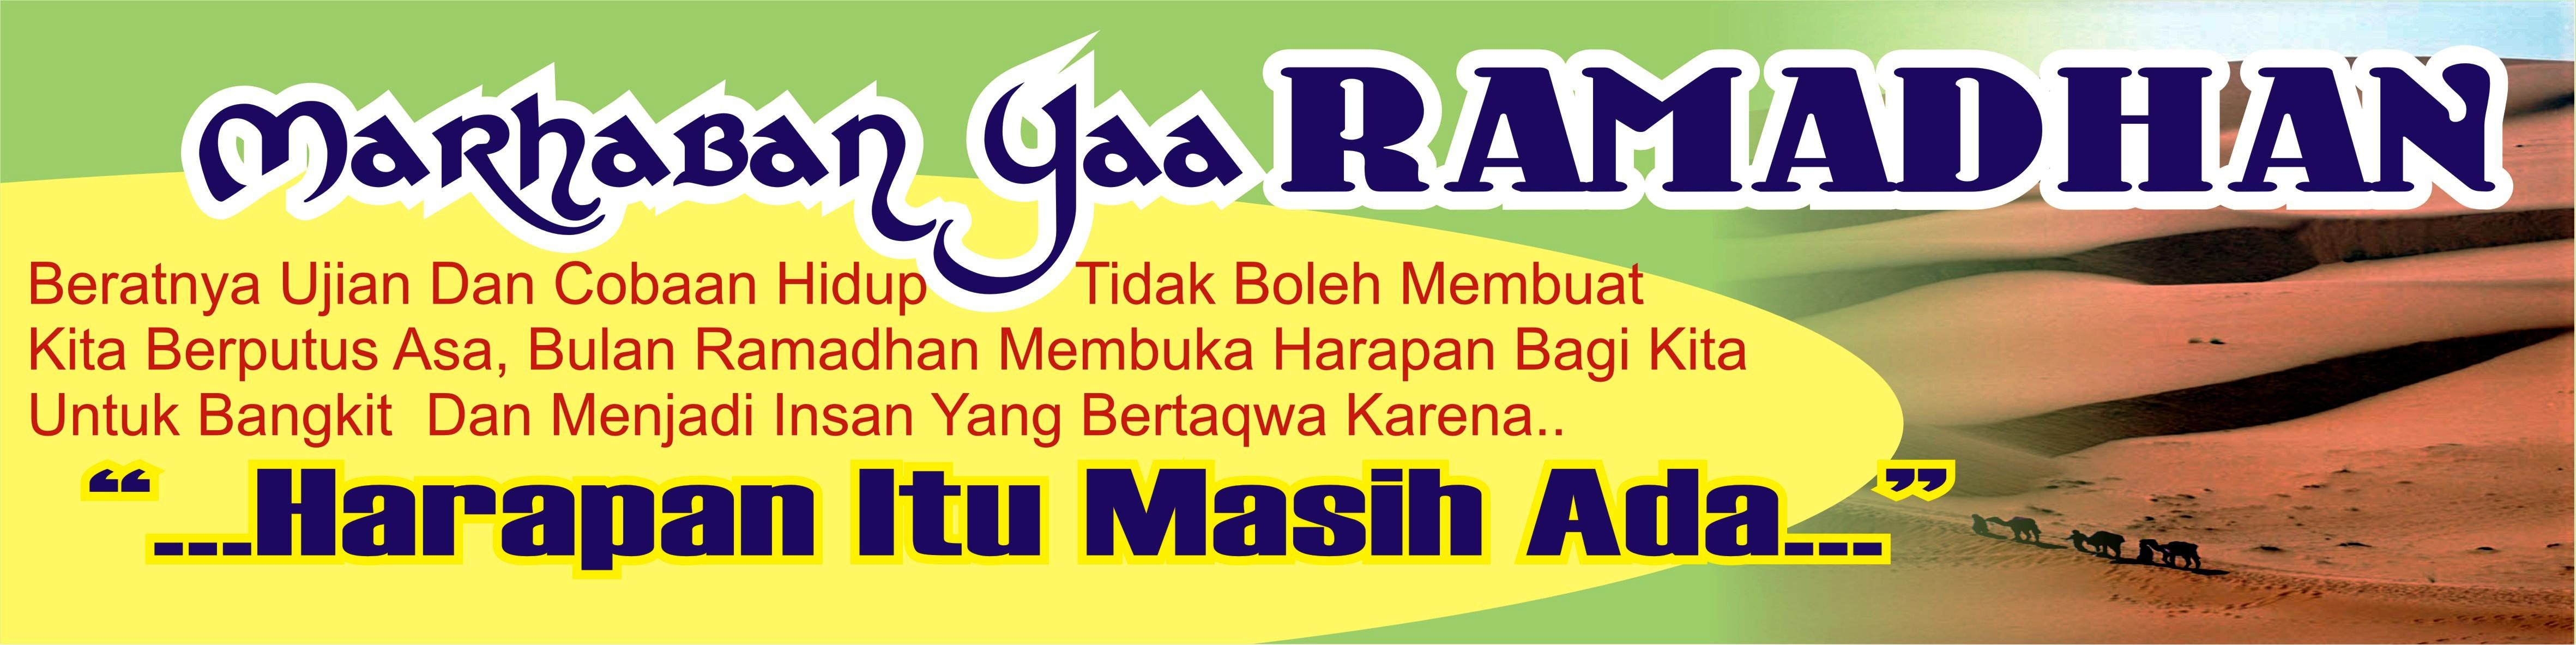 SMS Untuk Menyambut Bulan Suci Ramadhan 1434H 2013 BiellSoft